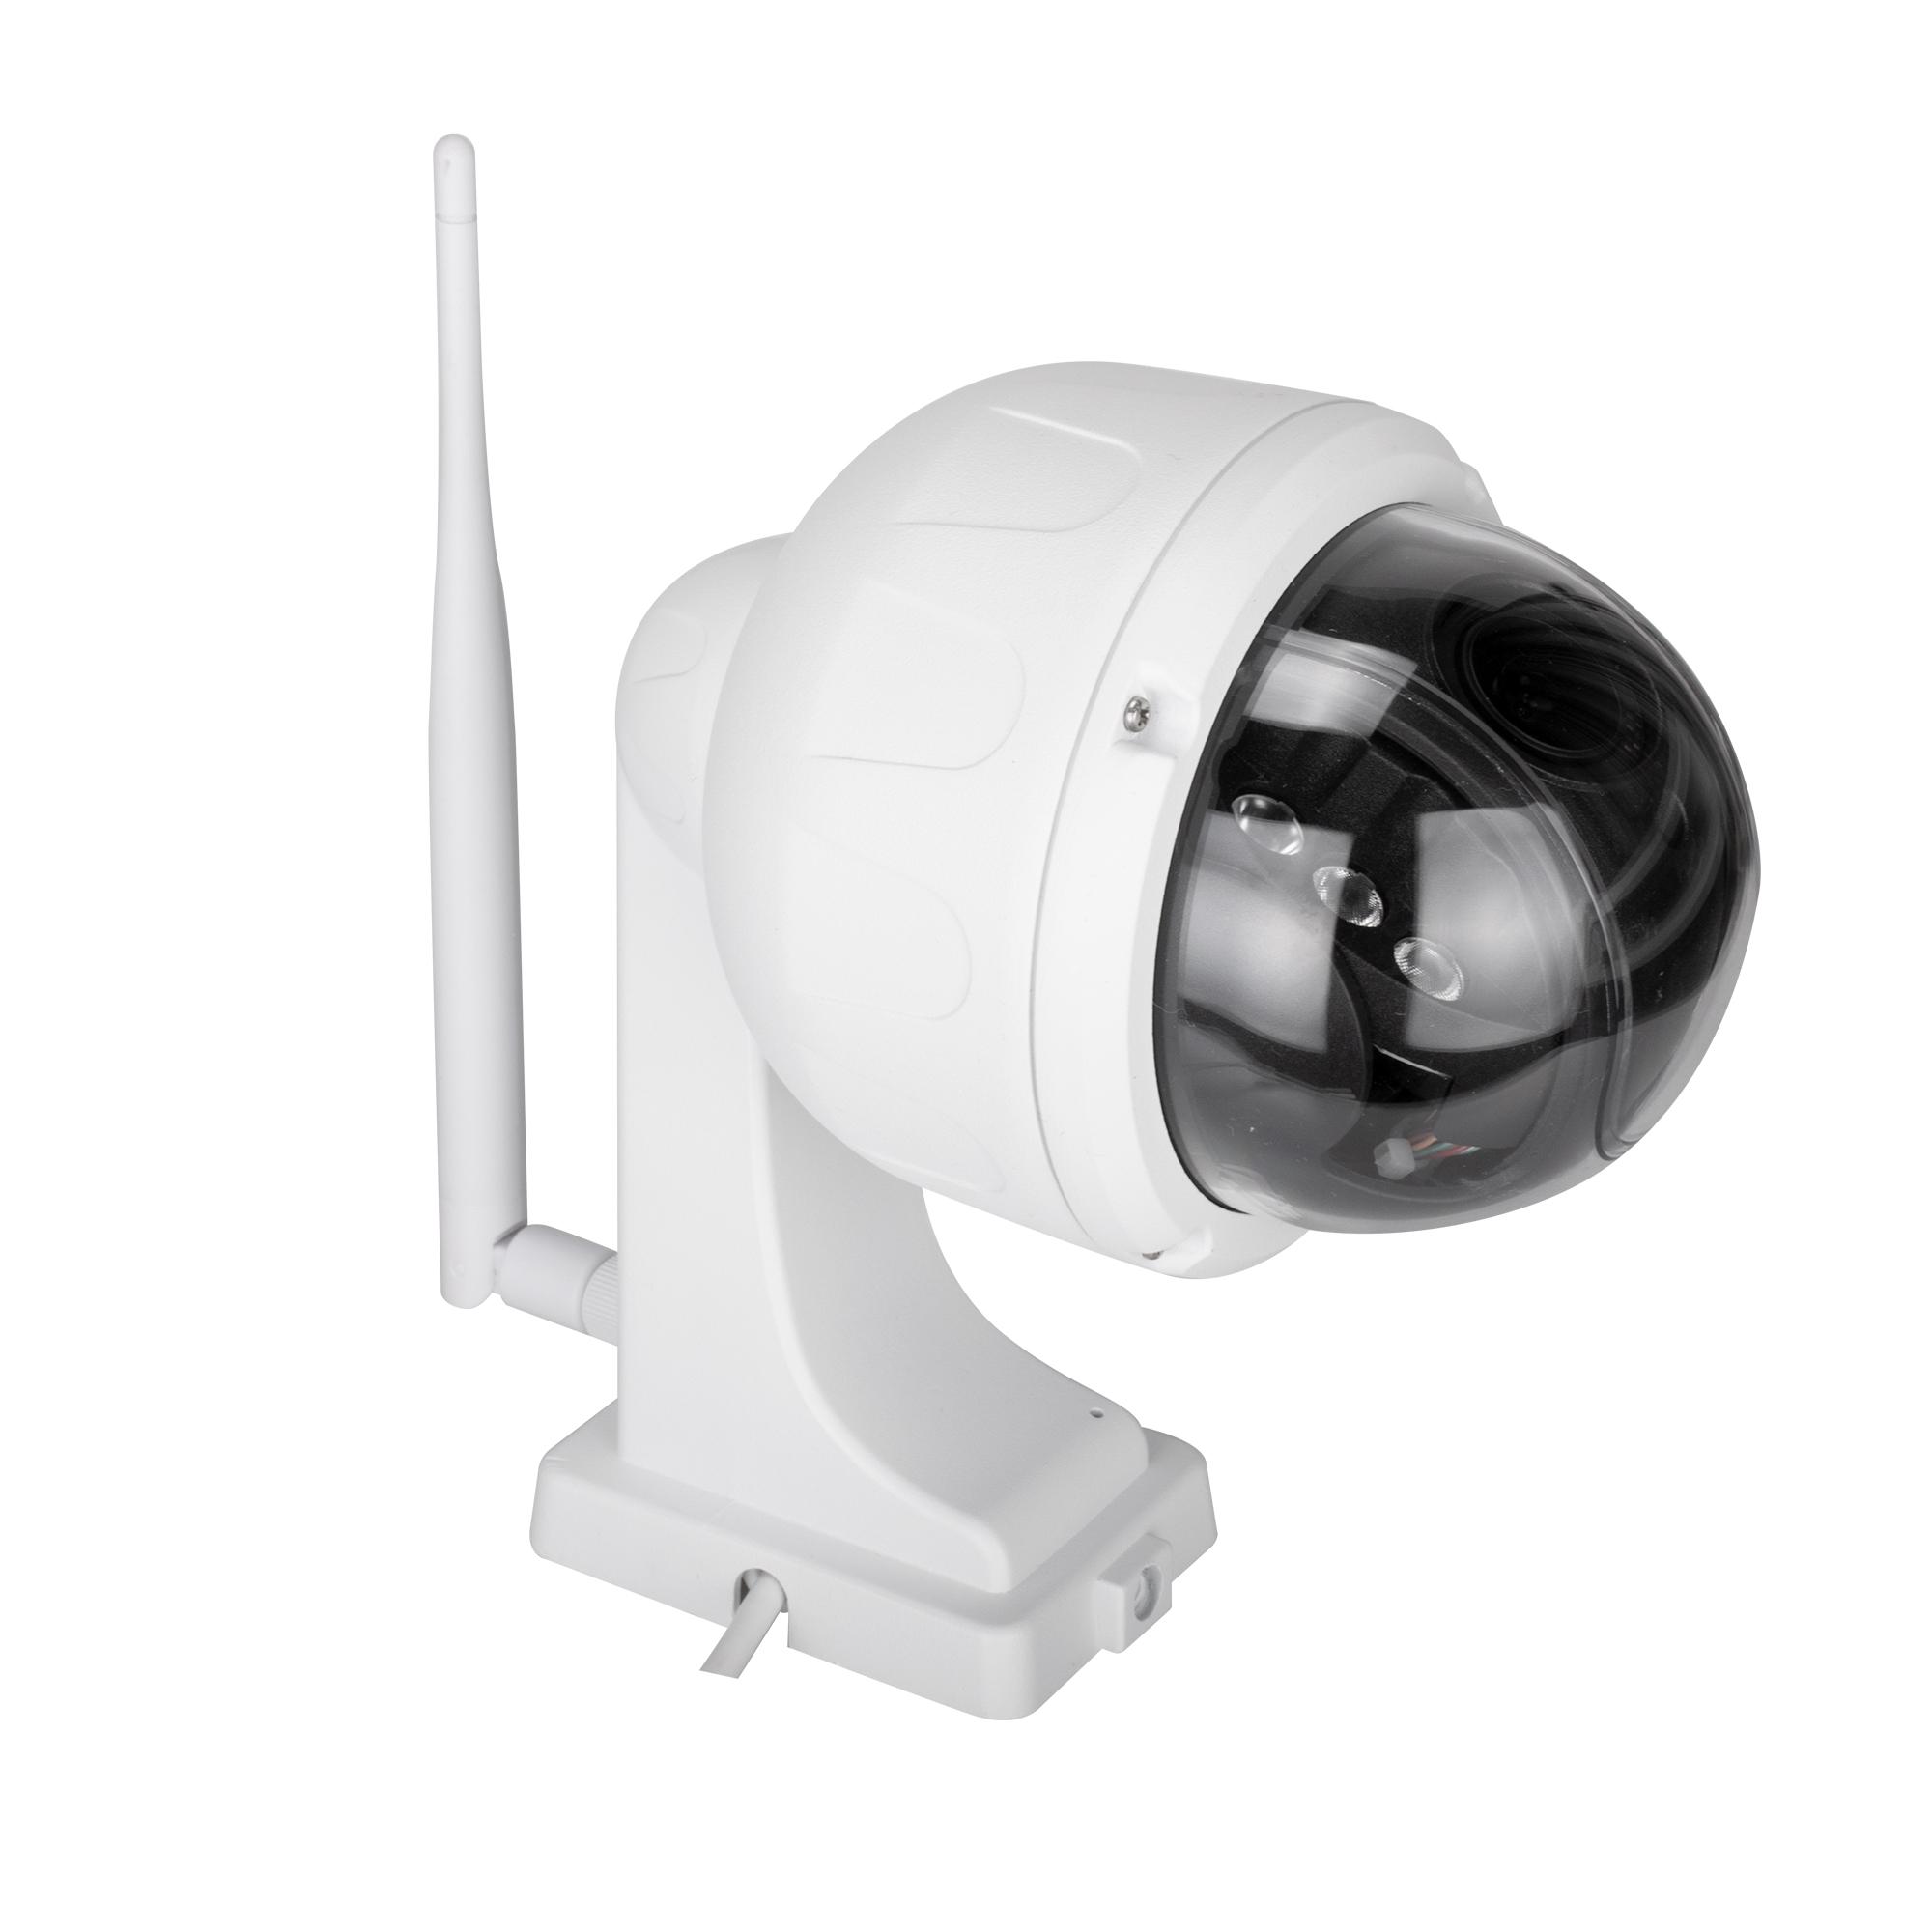 Wireless PTZ Dome IP Camera Outdoor 720P HD 4X Zoom CCTV Security Video Network Surveillance IP Camera Wifi C7833WIP-X4